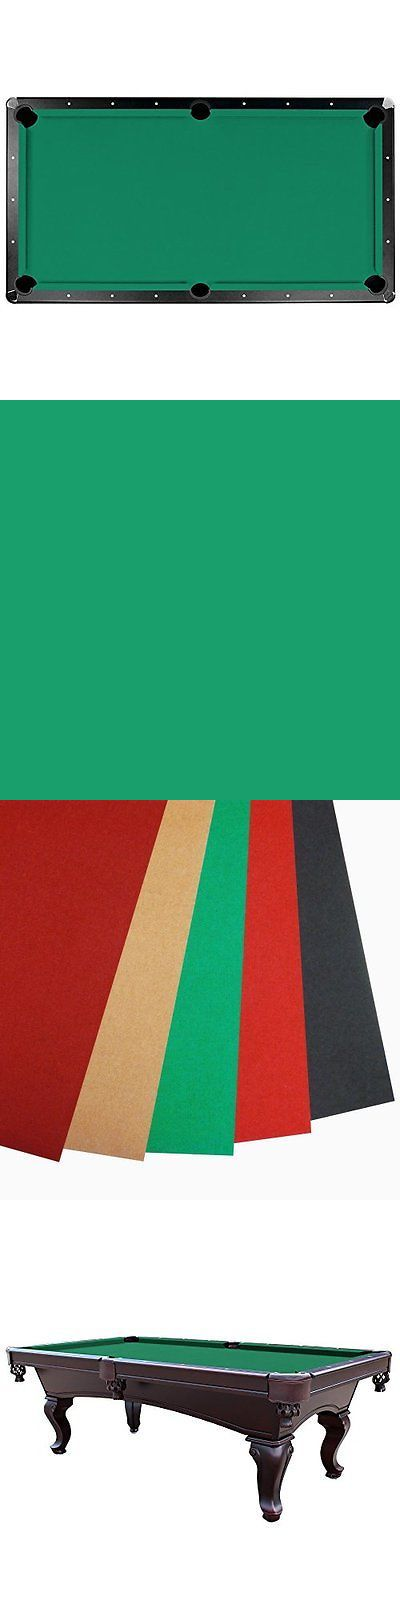 Tables 21213: Championship Saturn Ii Billiards Cloth Pool Table Felt , Green, 7-Feet -> BUY IT NOW ONLY: $126.49 on eBay!